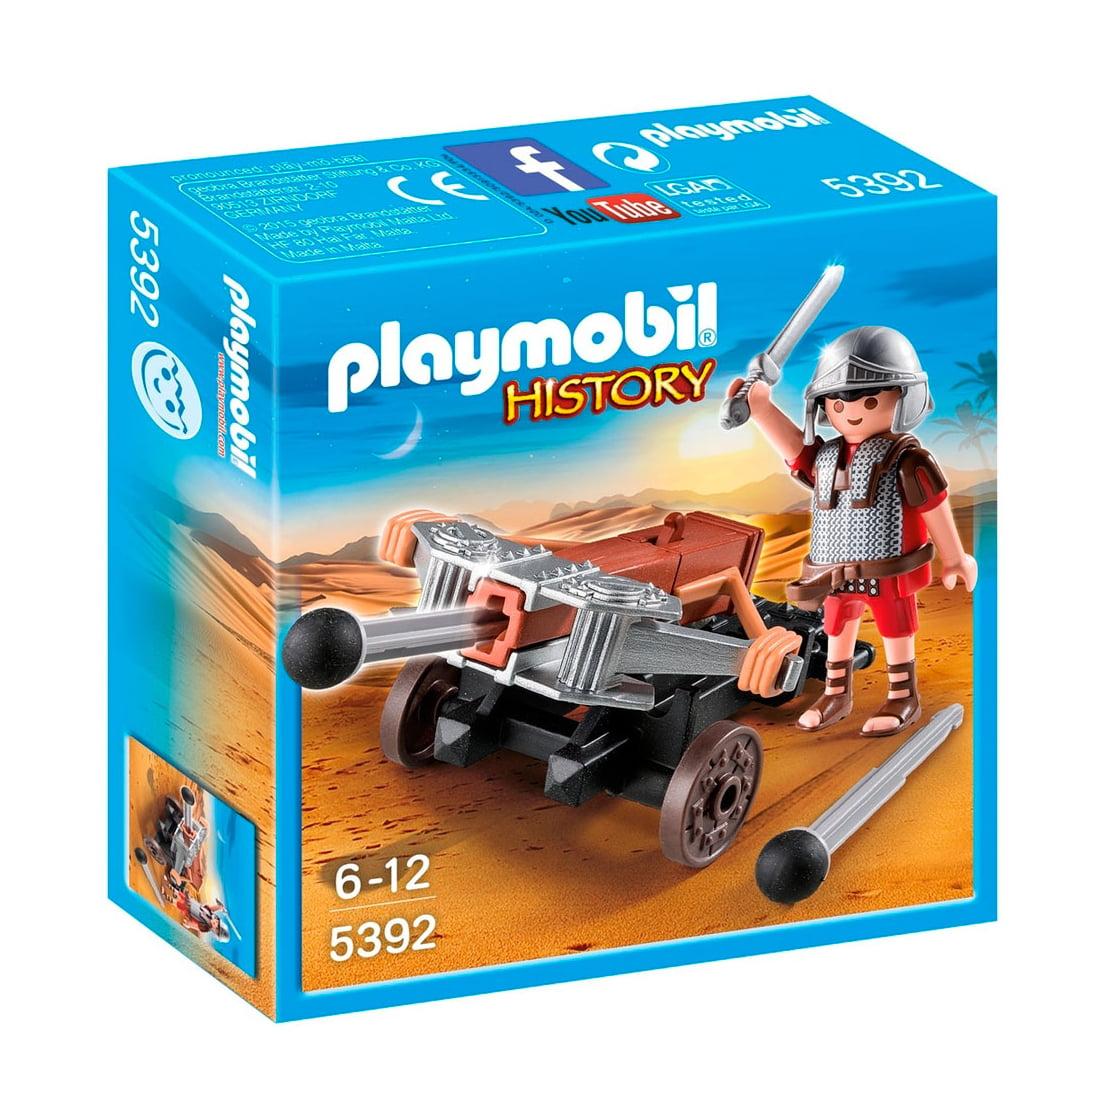 PLAYMOBIL - KIT - HISTORY - 5392